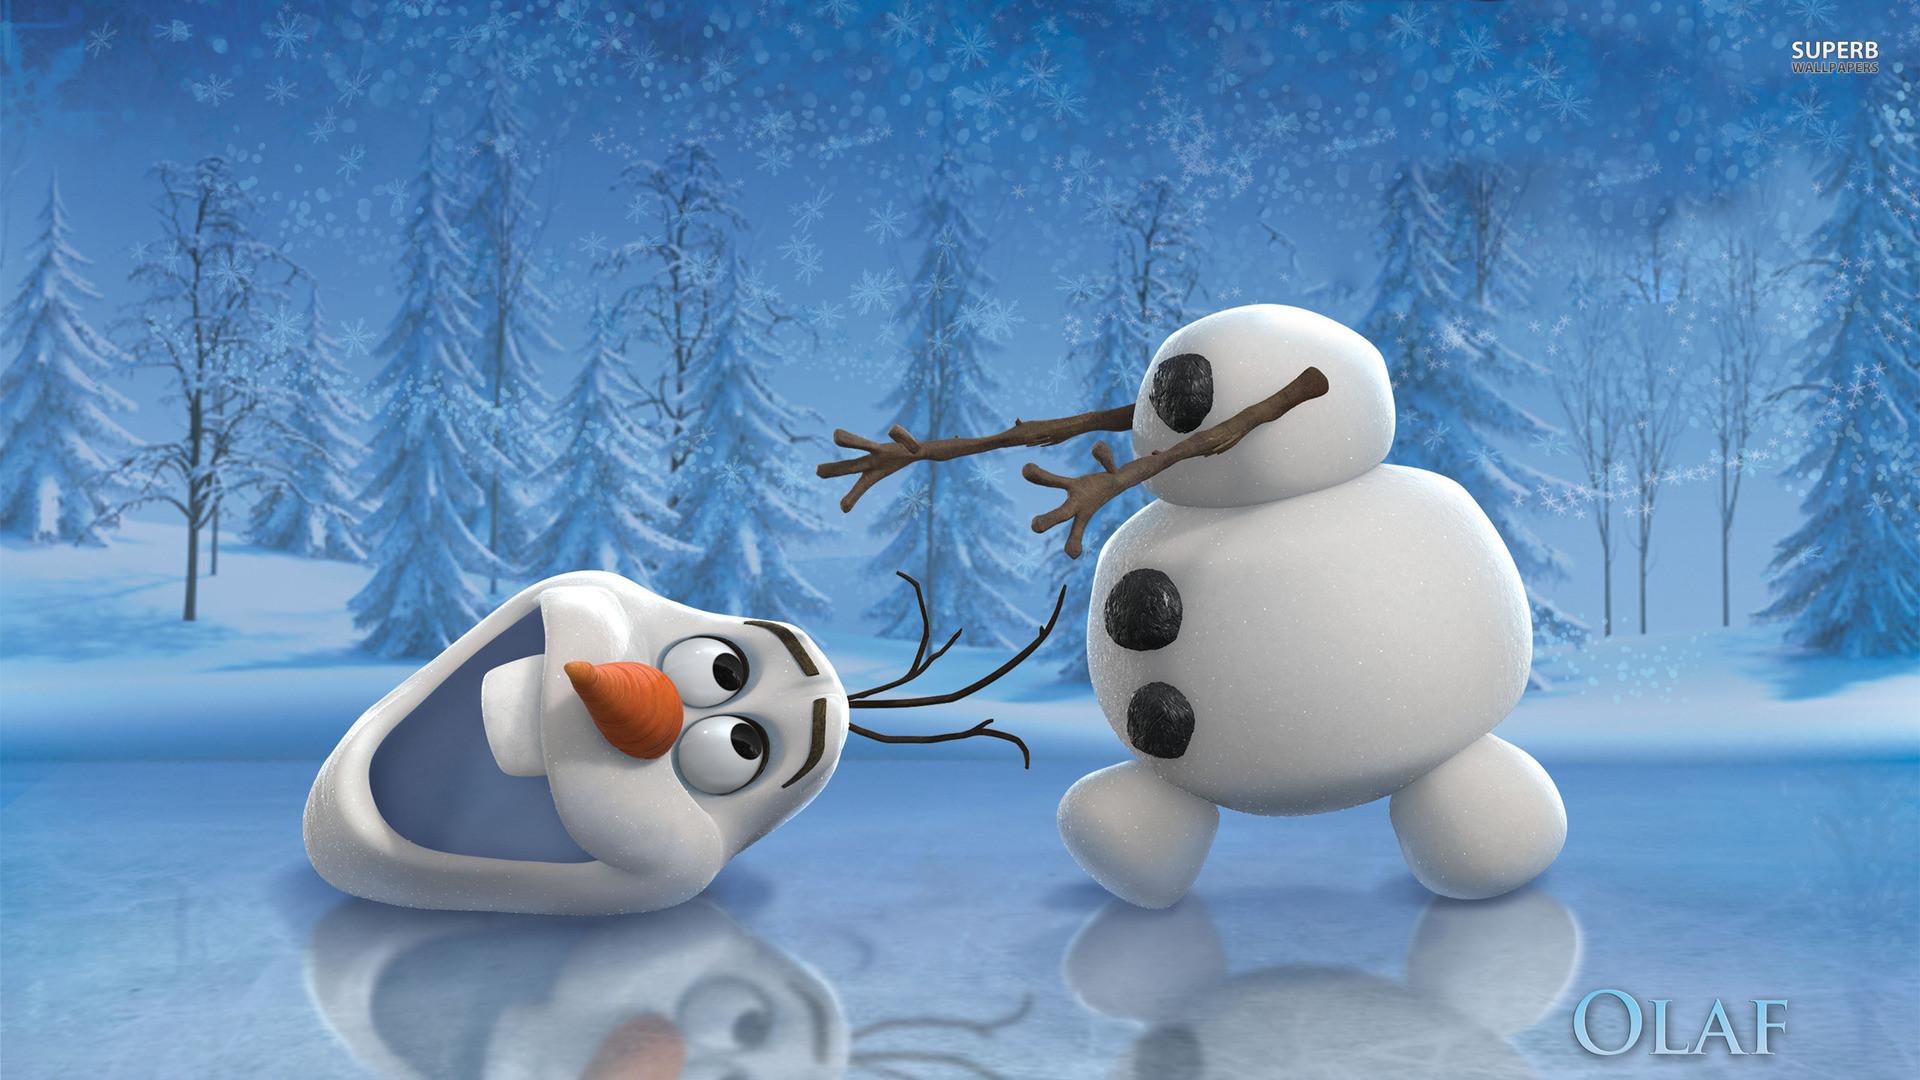 olaf wallpaper hd,snowman,winter,snow,sky,freezing